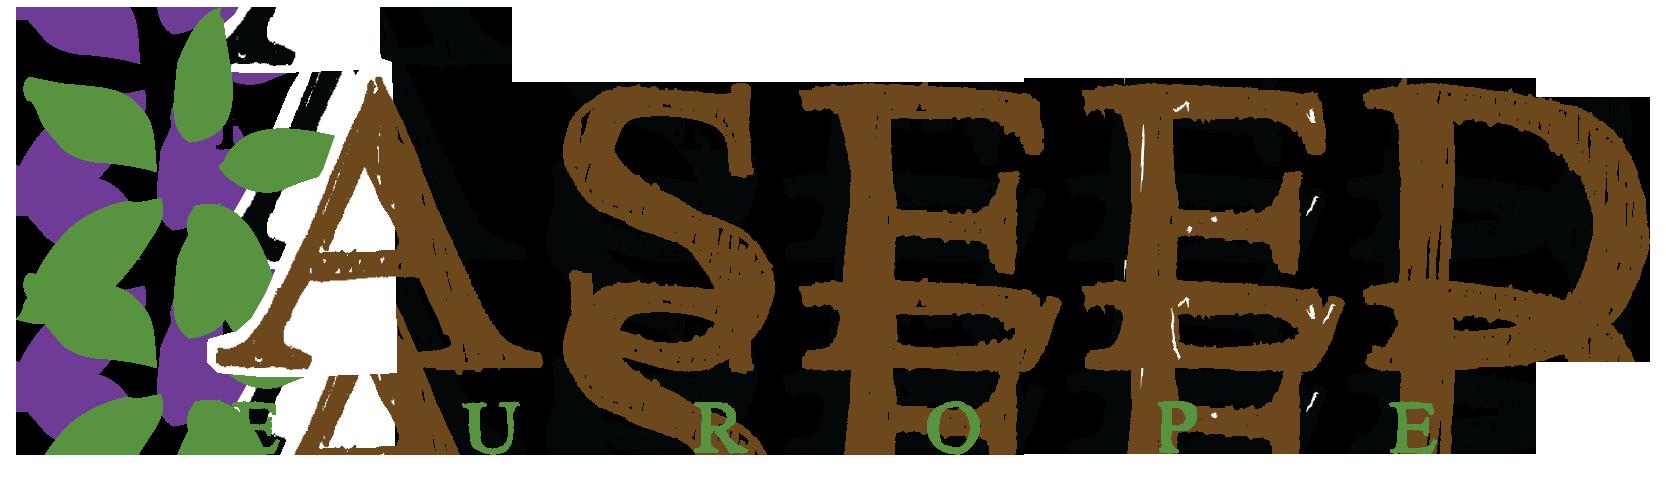 green_aseedeuro